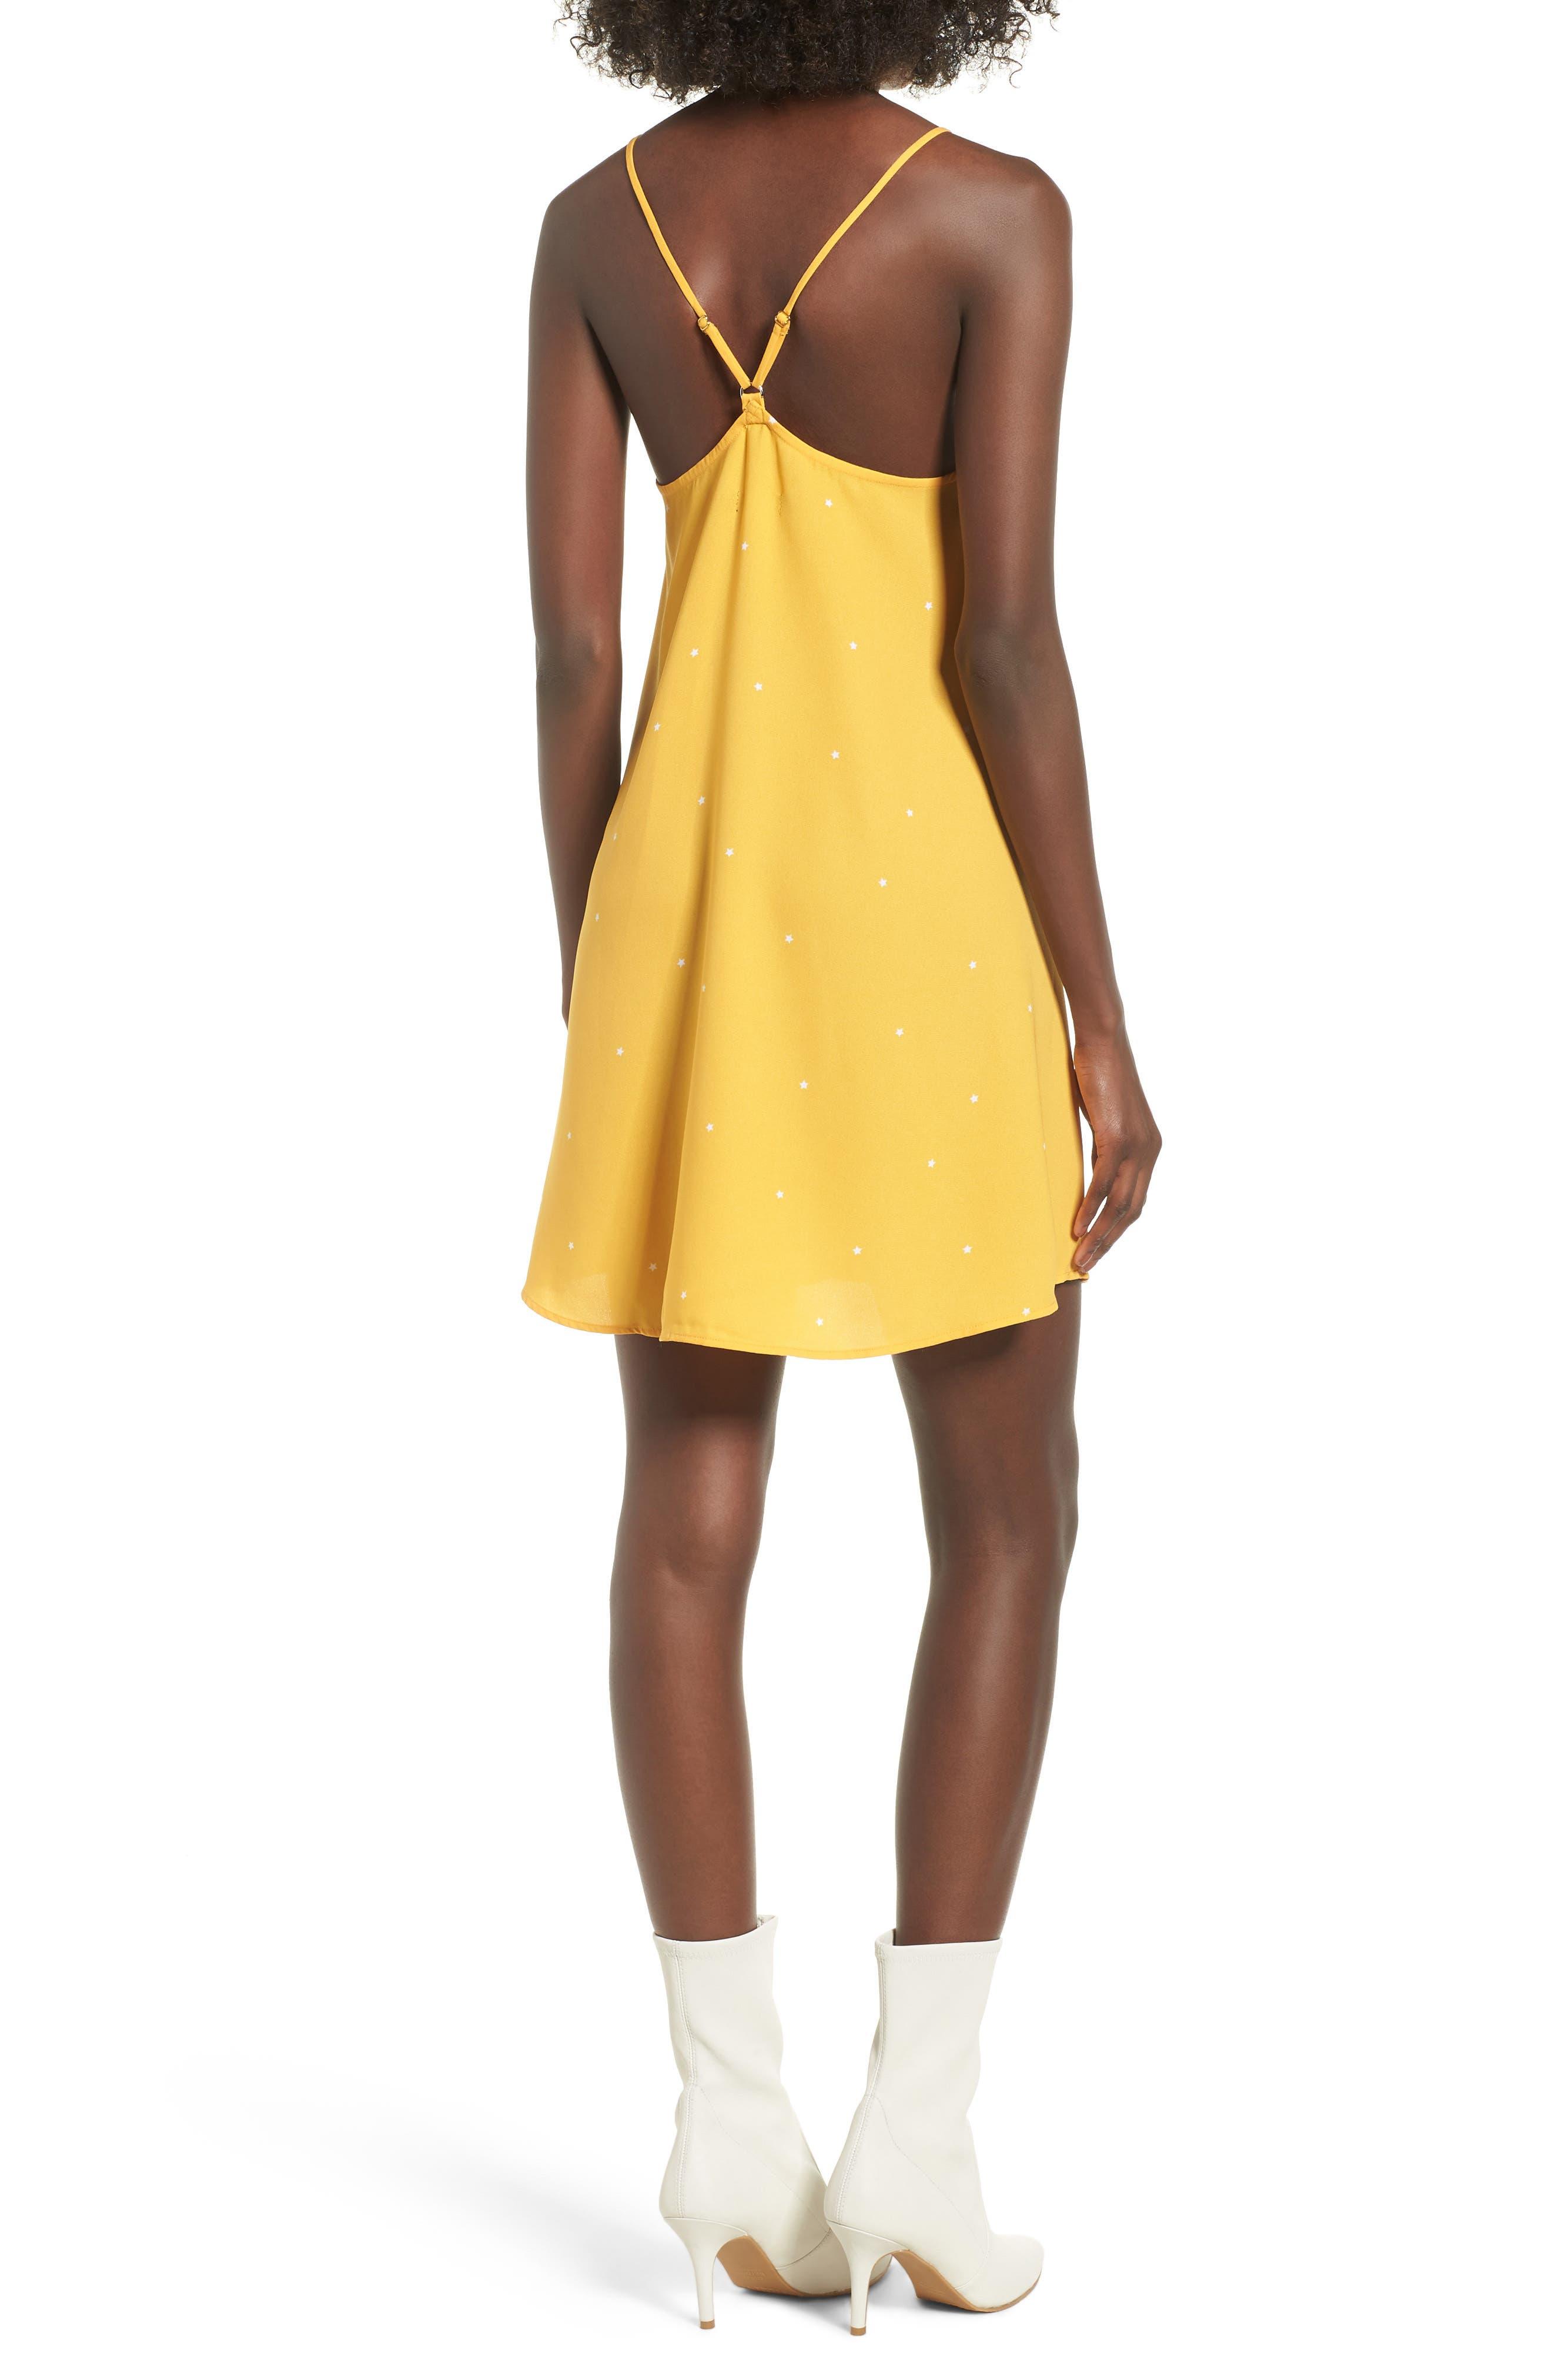 Mental 4 Metal Star Print Dress,                             Alternate thumbnail 2, color,                             Citrus Gold